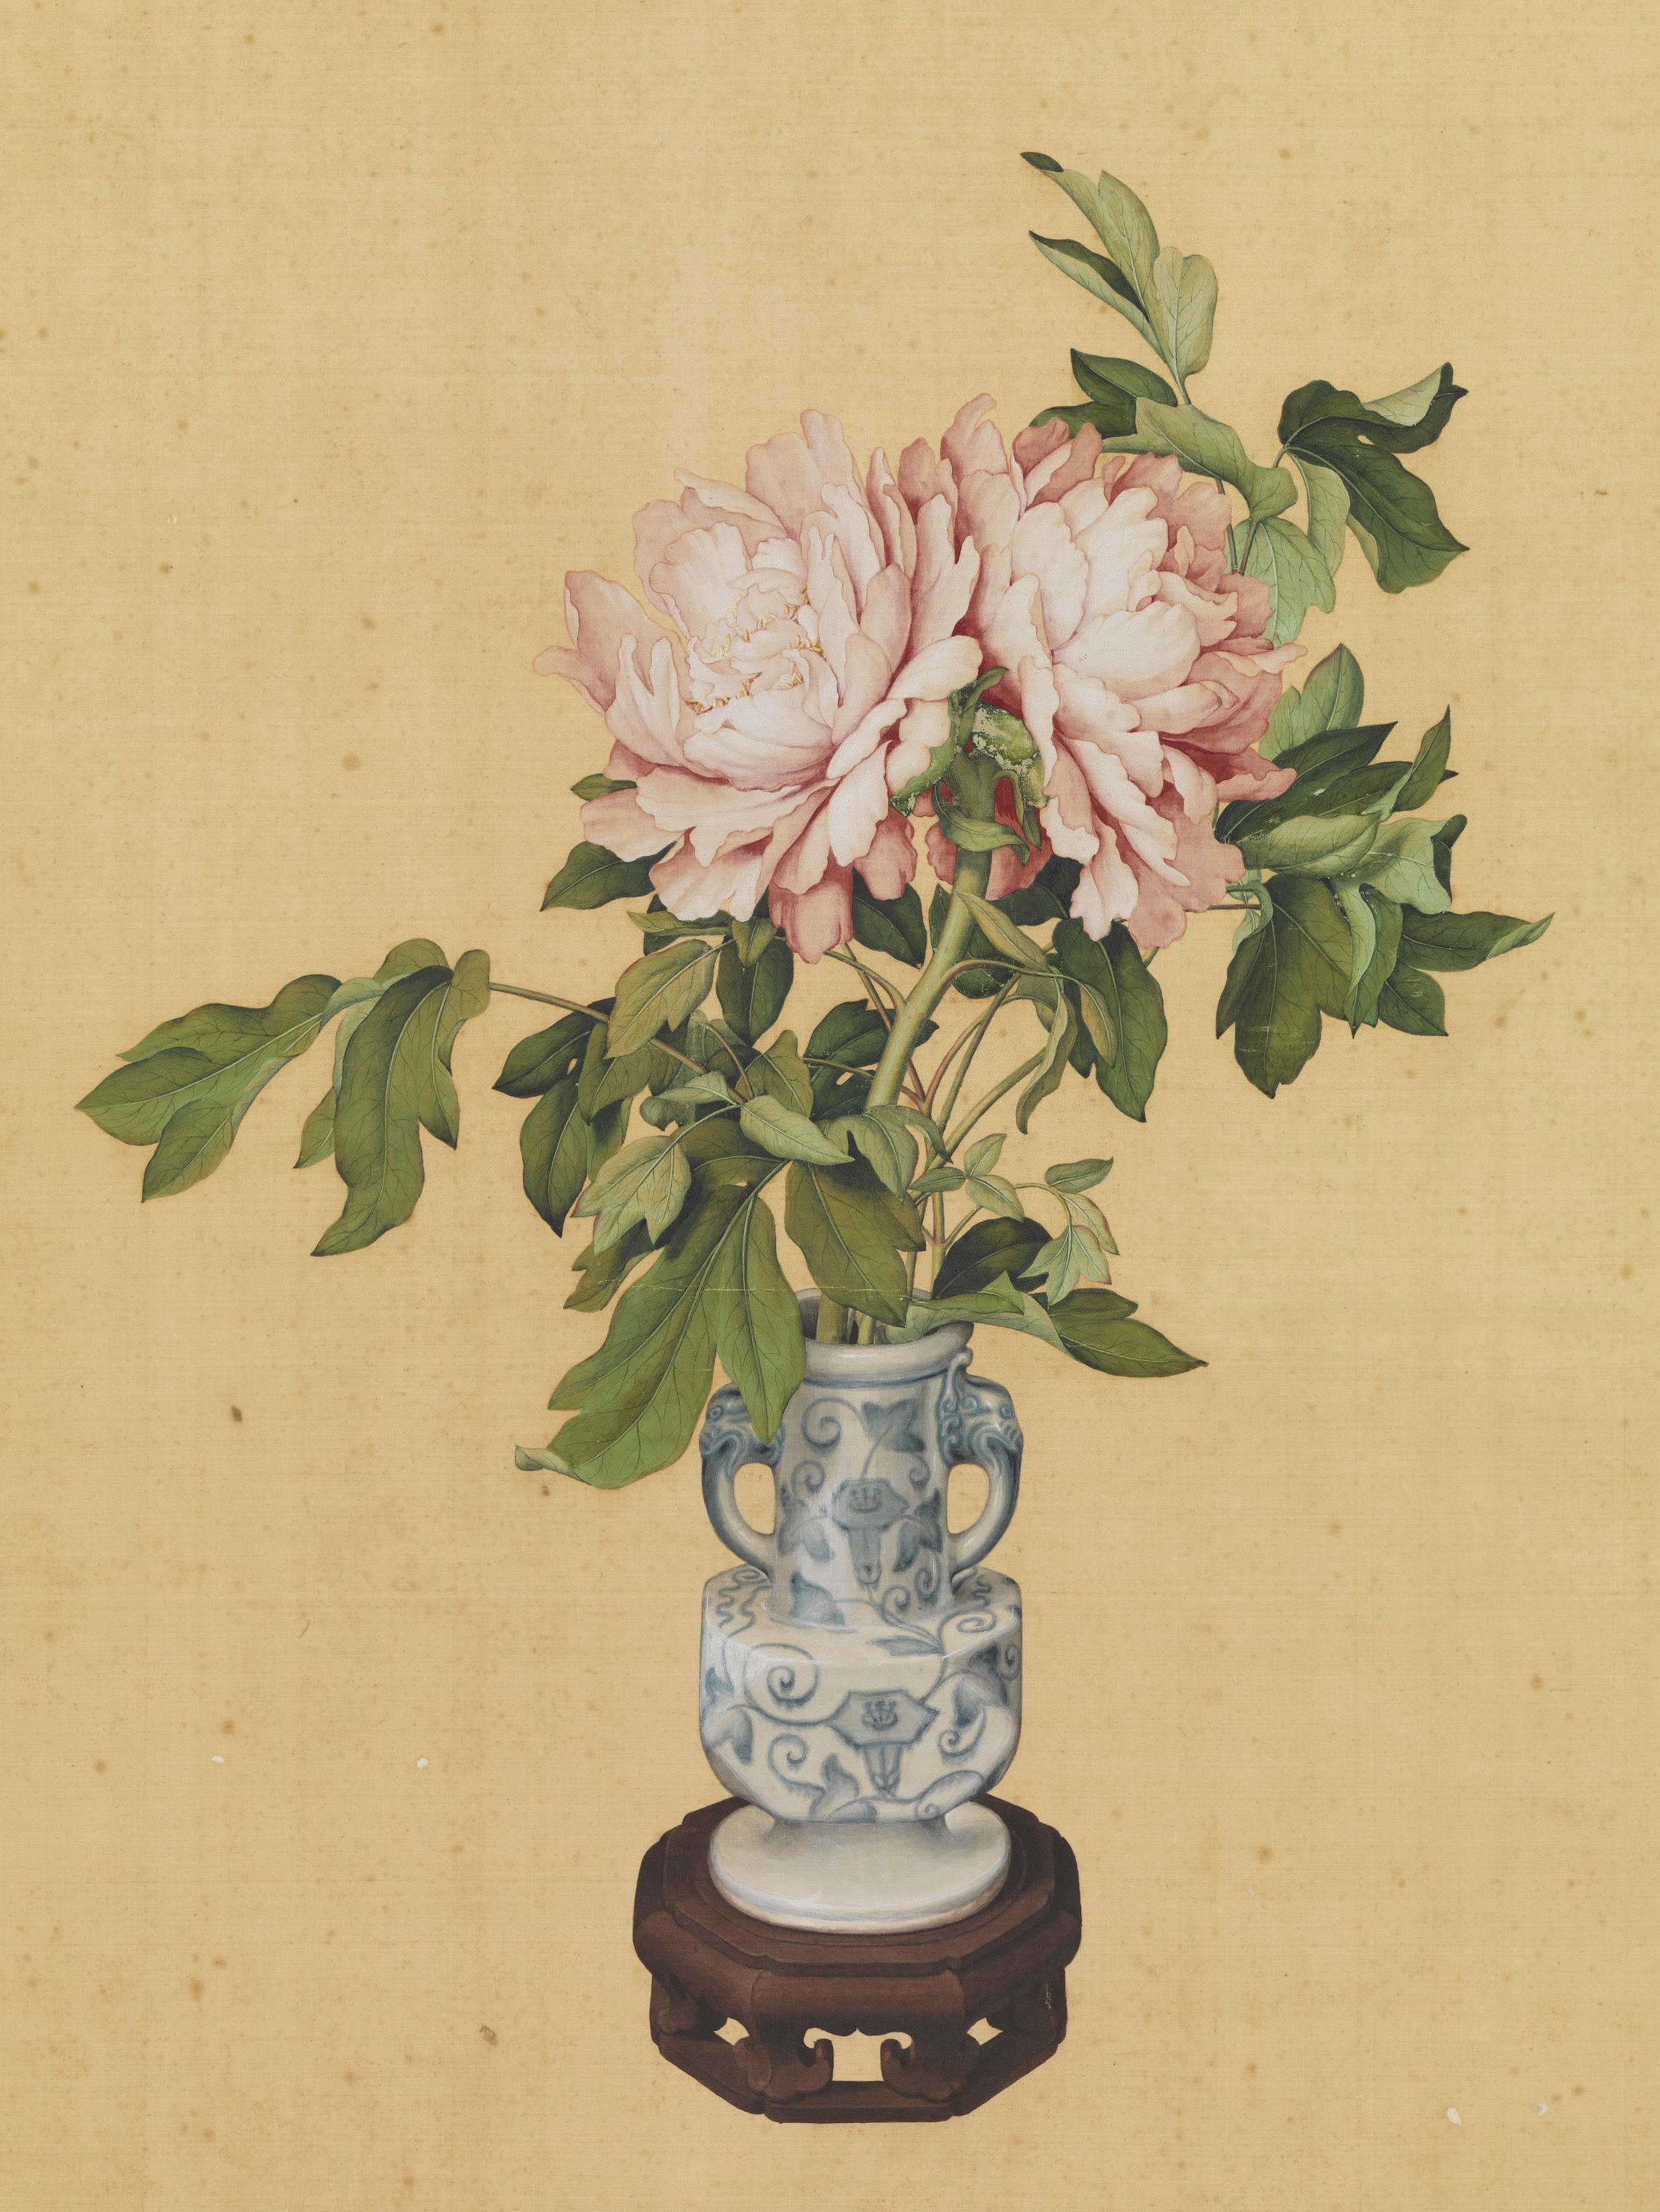 Filegiuseppe castiglione vase of flowersg wikimedia commons filegiuseppe castiglione vase of flowersg reviewsmspy